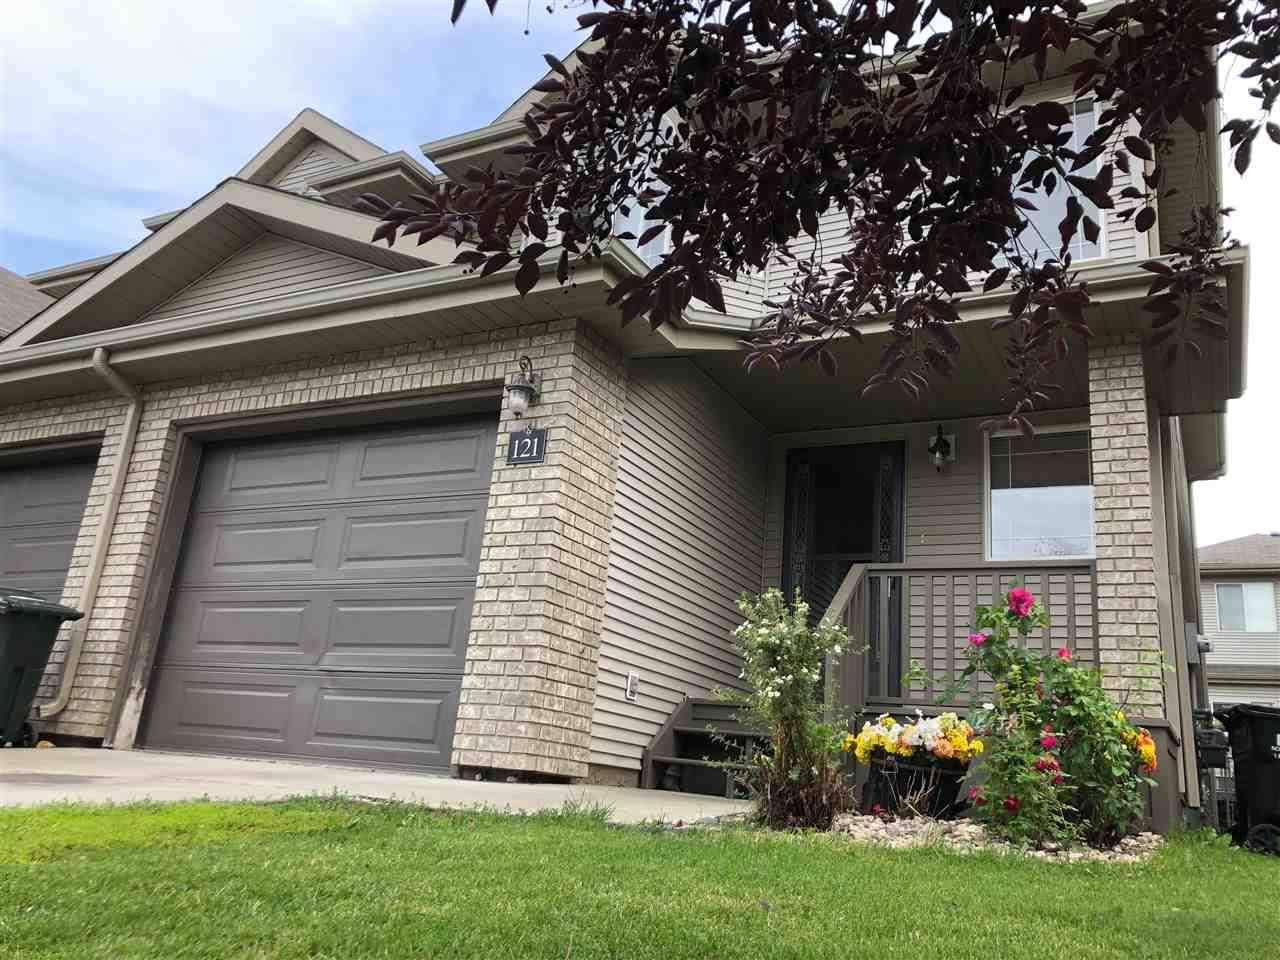 Townhouse for sale at 155 Crocus Cres Unit 121 Sherwood Park Alberta - MLS: E4168073